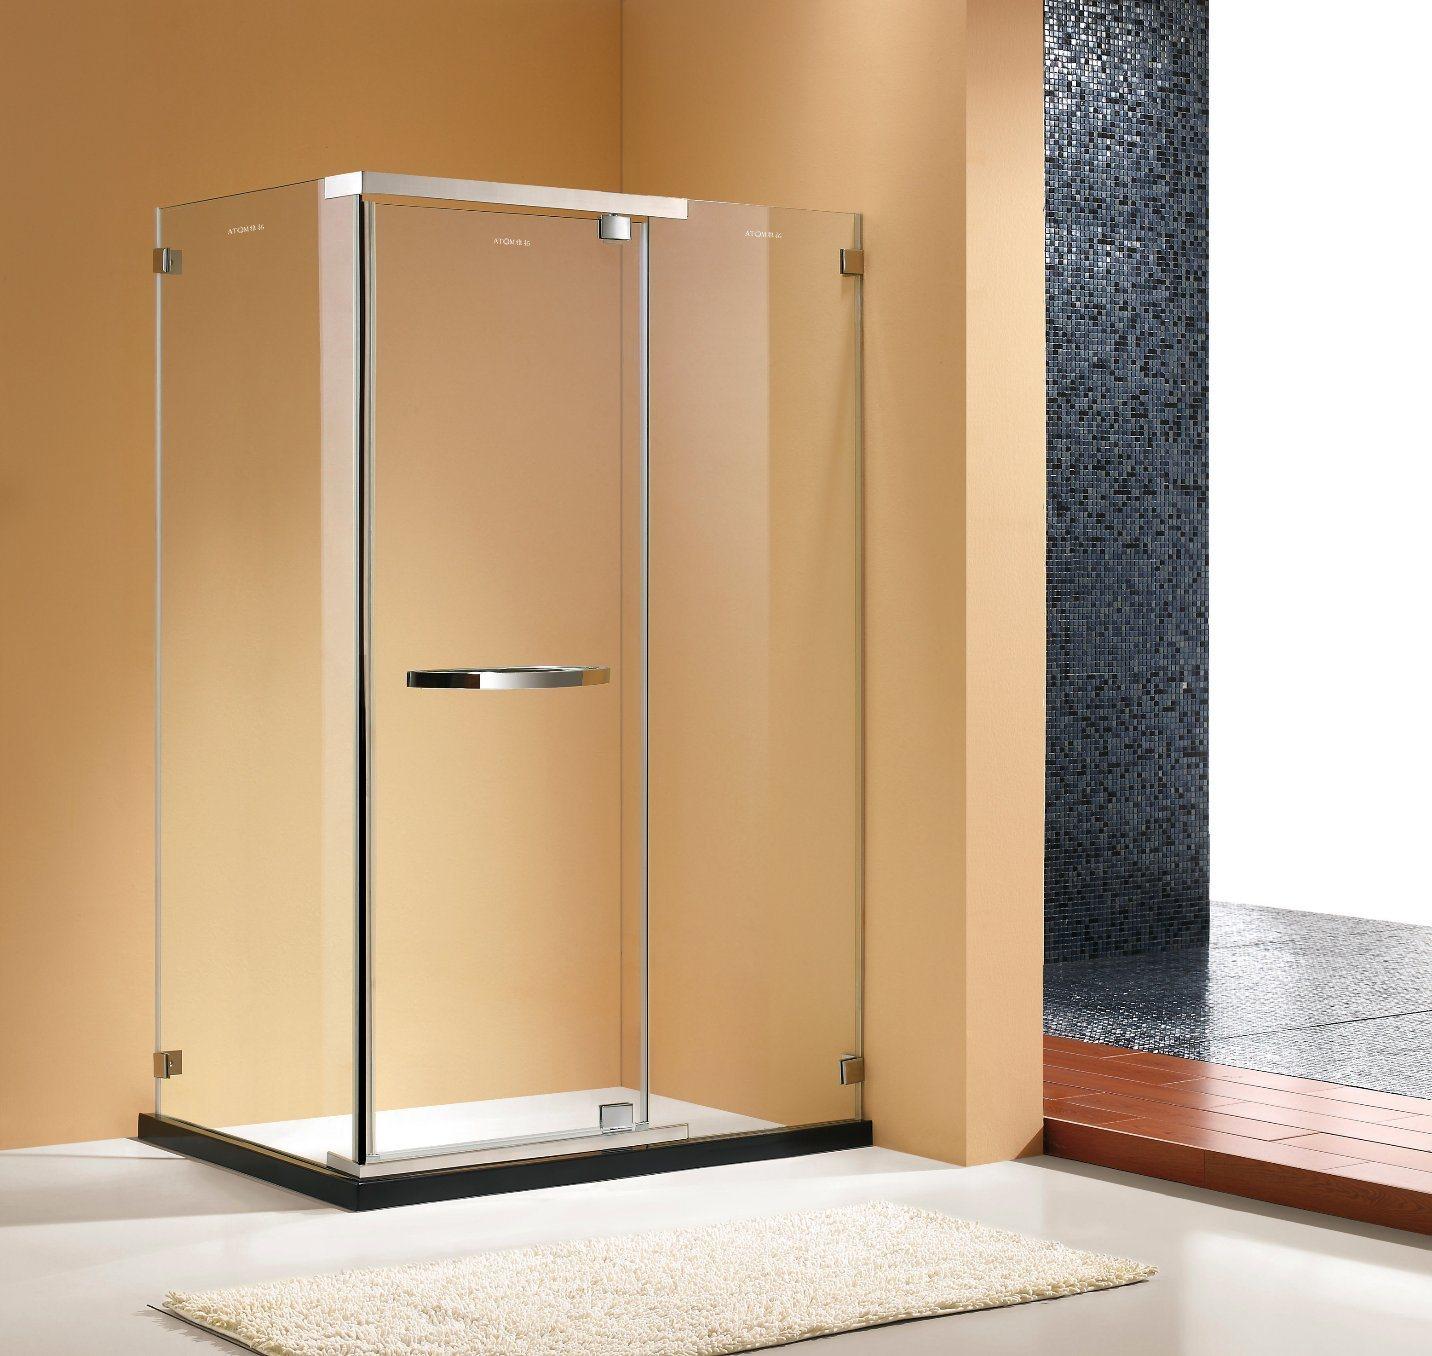 Hot Item Chrome Finish Frameless Pivot Shower Enclosure 3 8 Glass